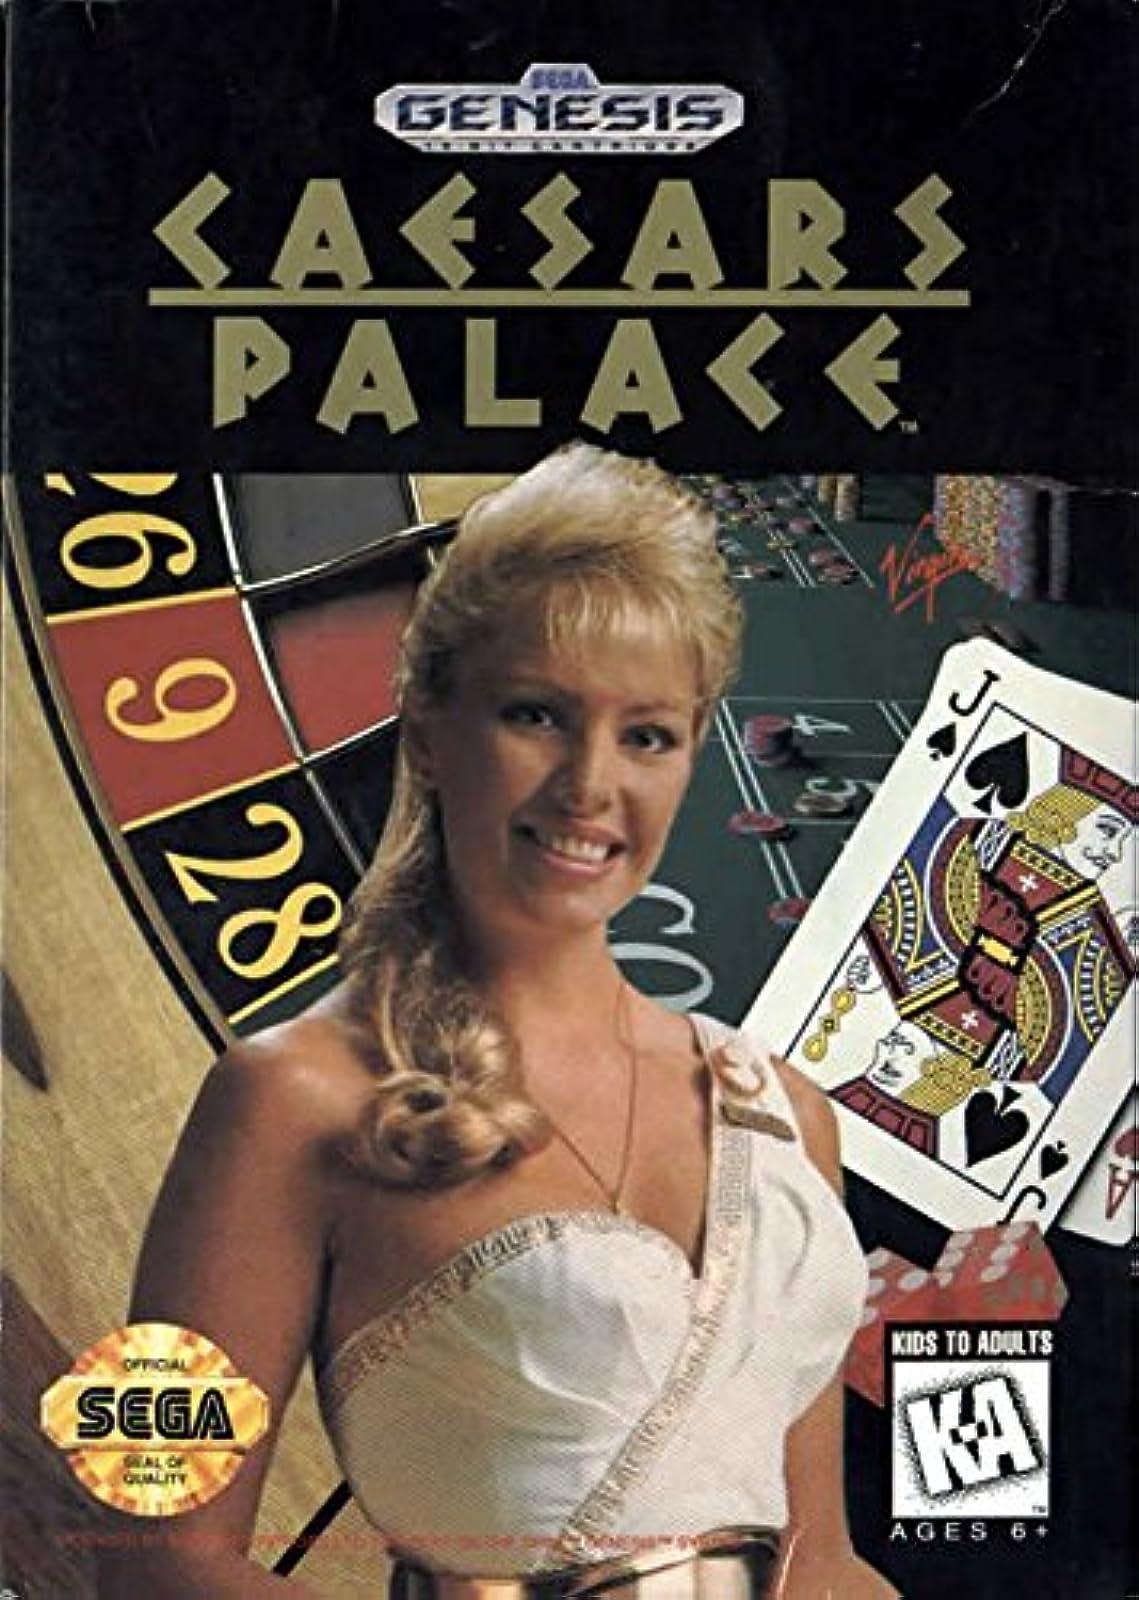 Caesars Palace For Sega Genesis Vintage